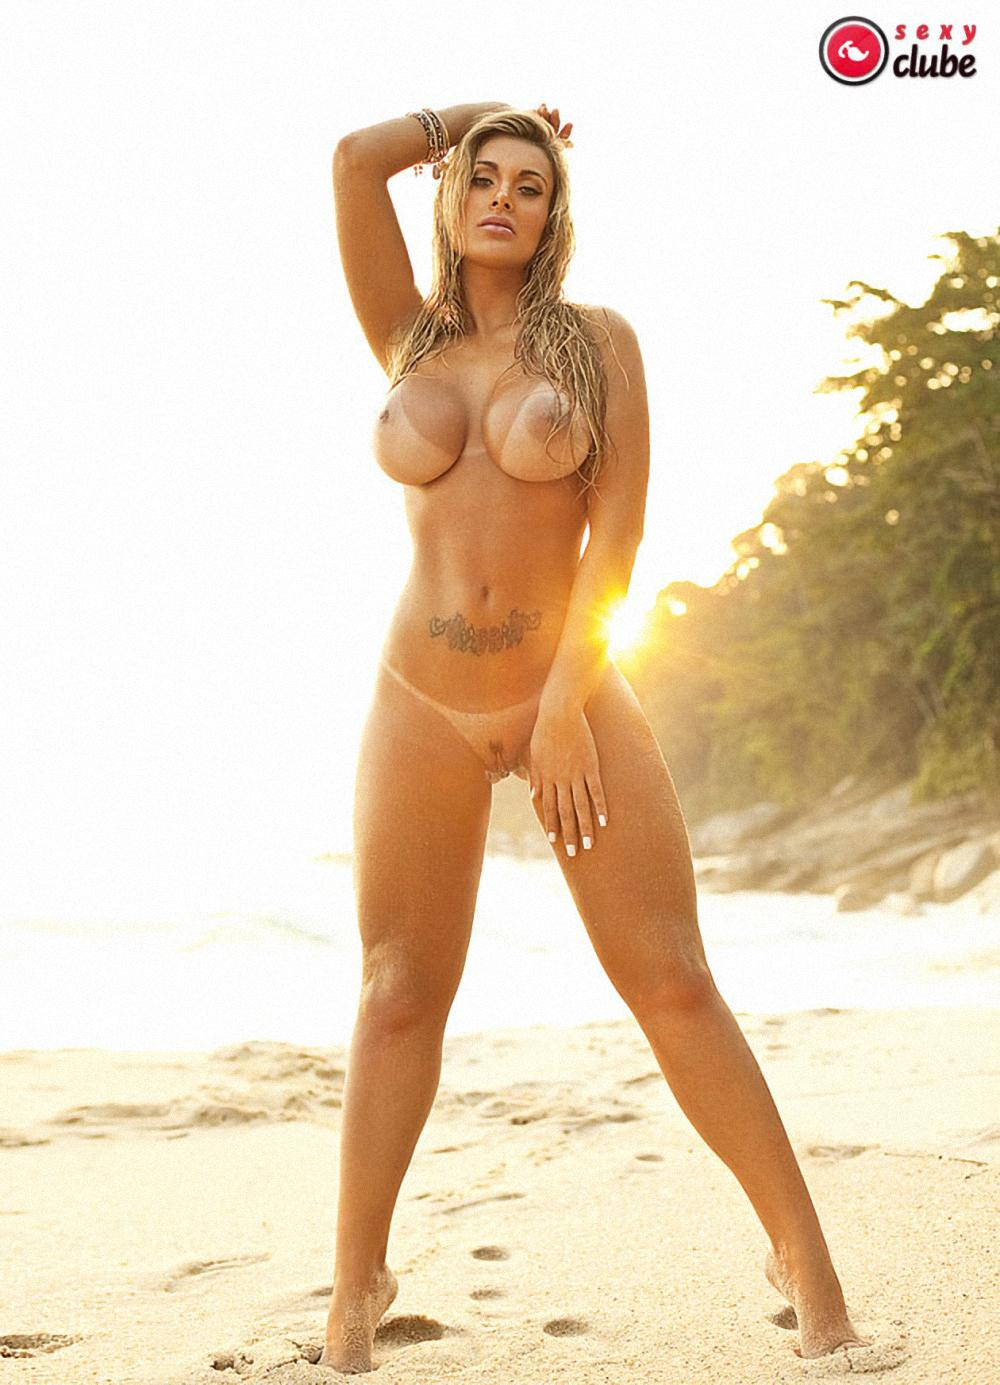 Andressa Urach Desnuda Página 7 Fotos Desnuda Descuido Topless